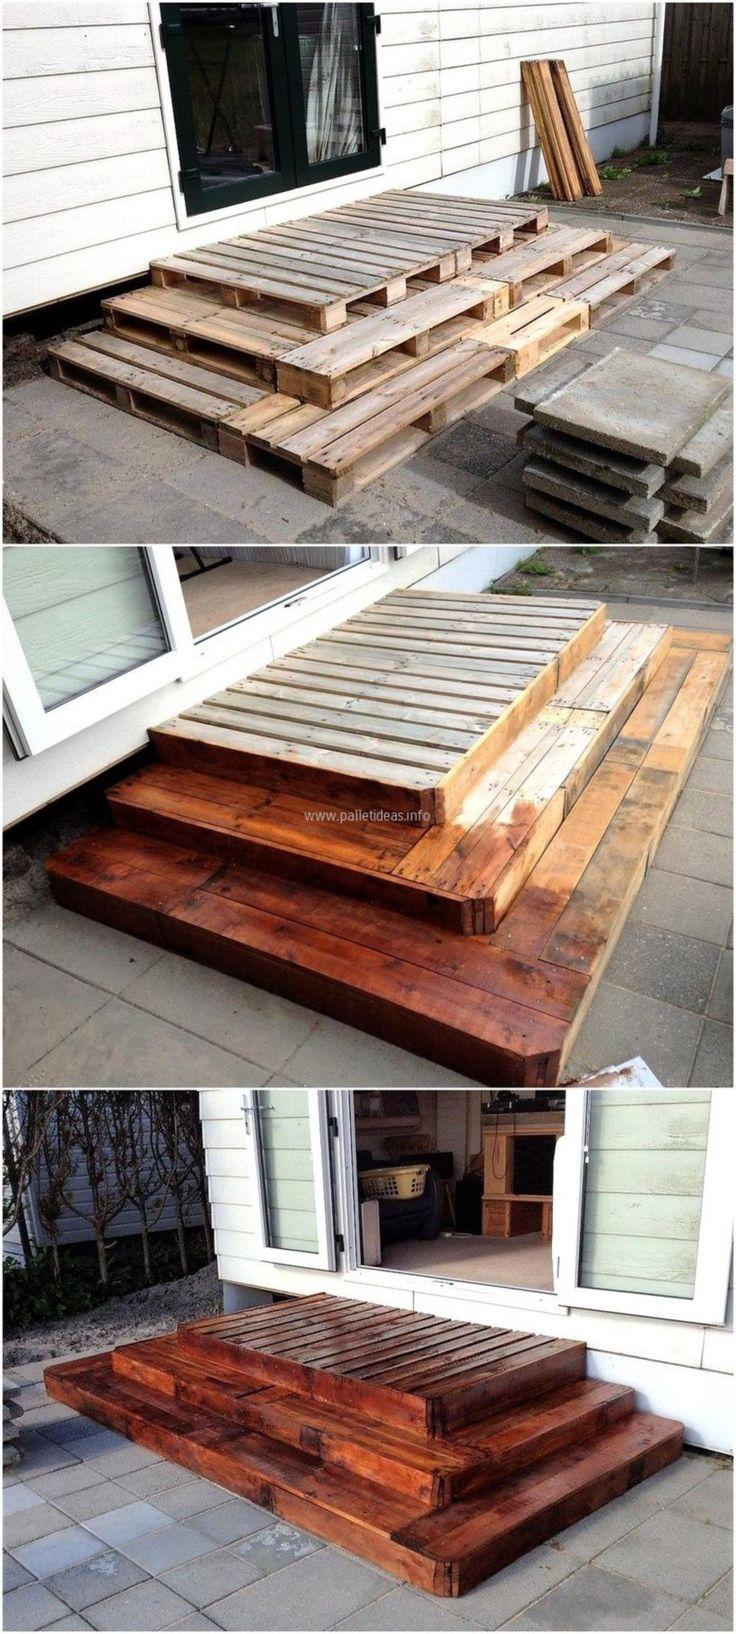 Best 25+ Patio ideas ideas on Pinterest | Backyard makeover ...